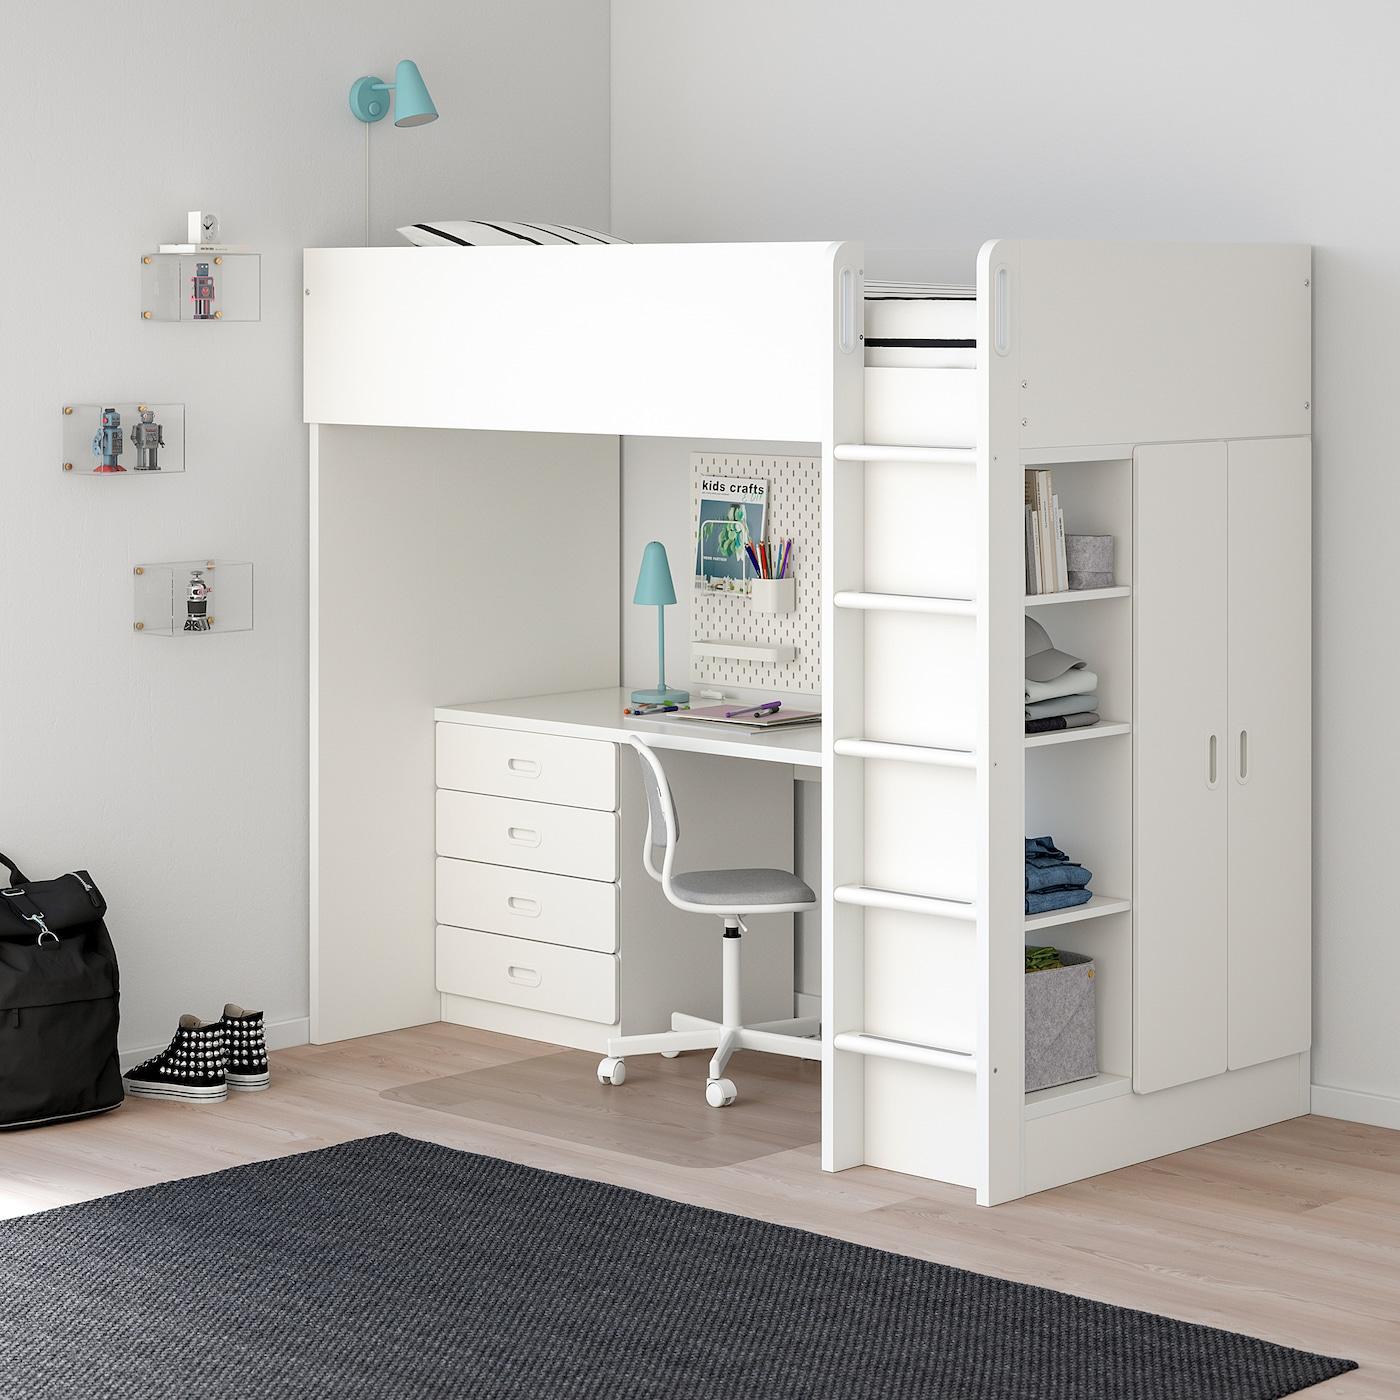 100 Incroyable Suggestions Stuva Lit Mezzanine Ikea